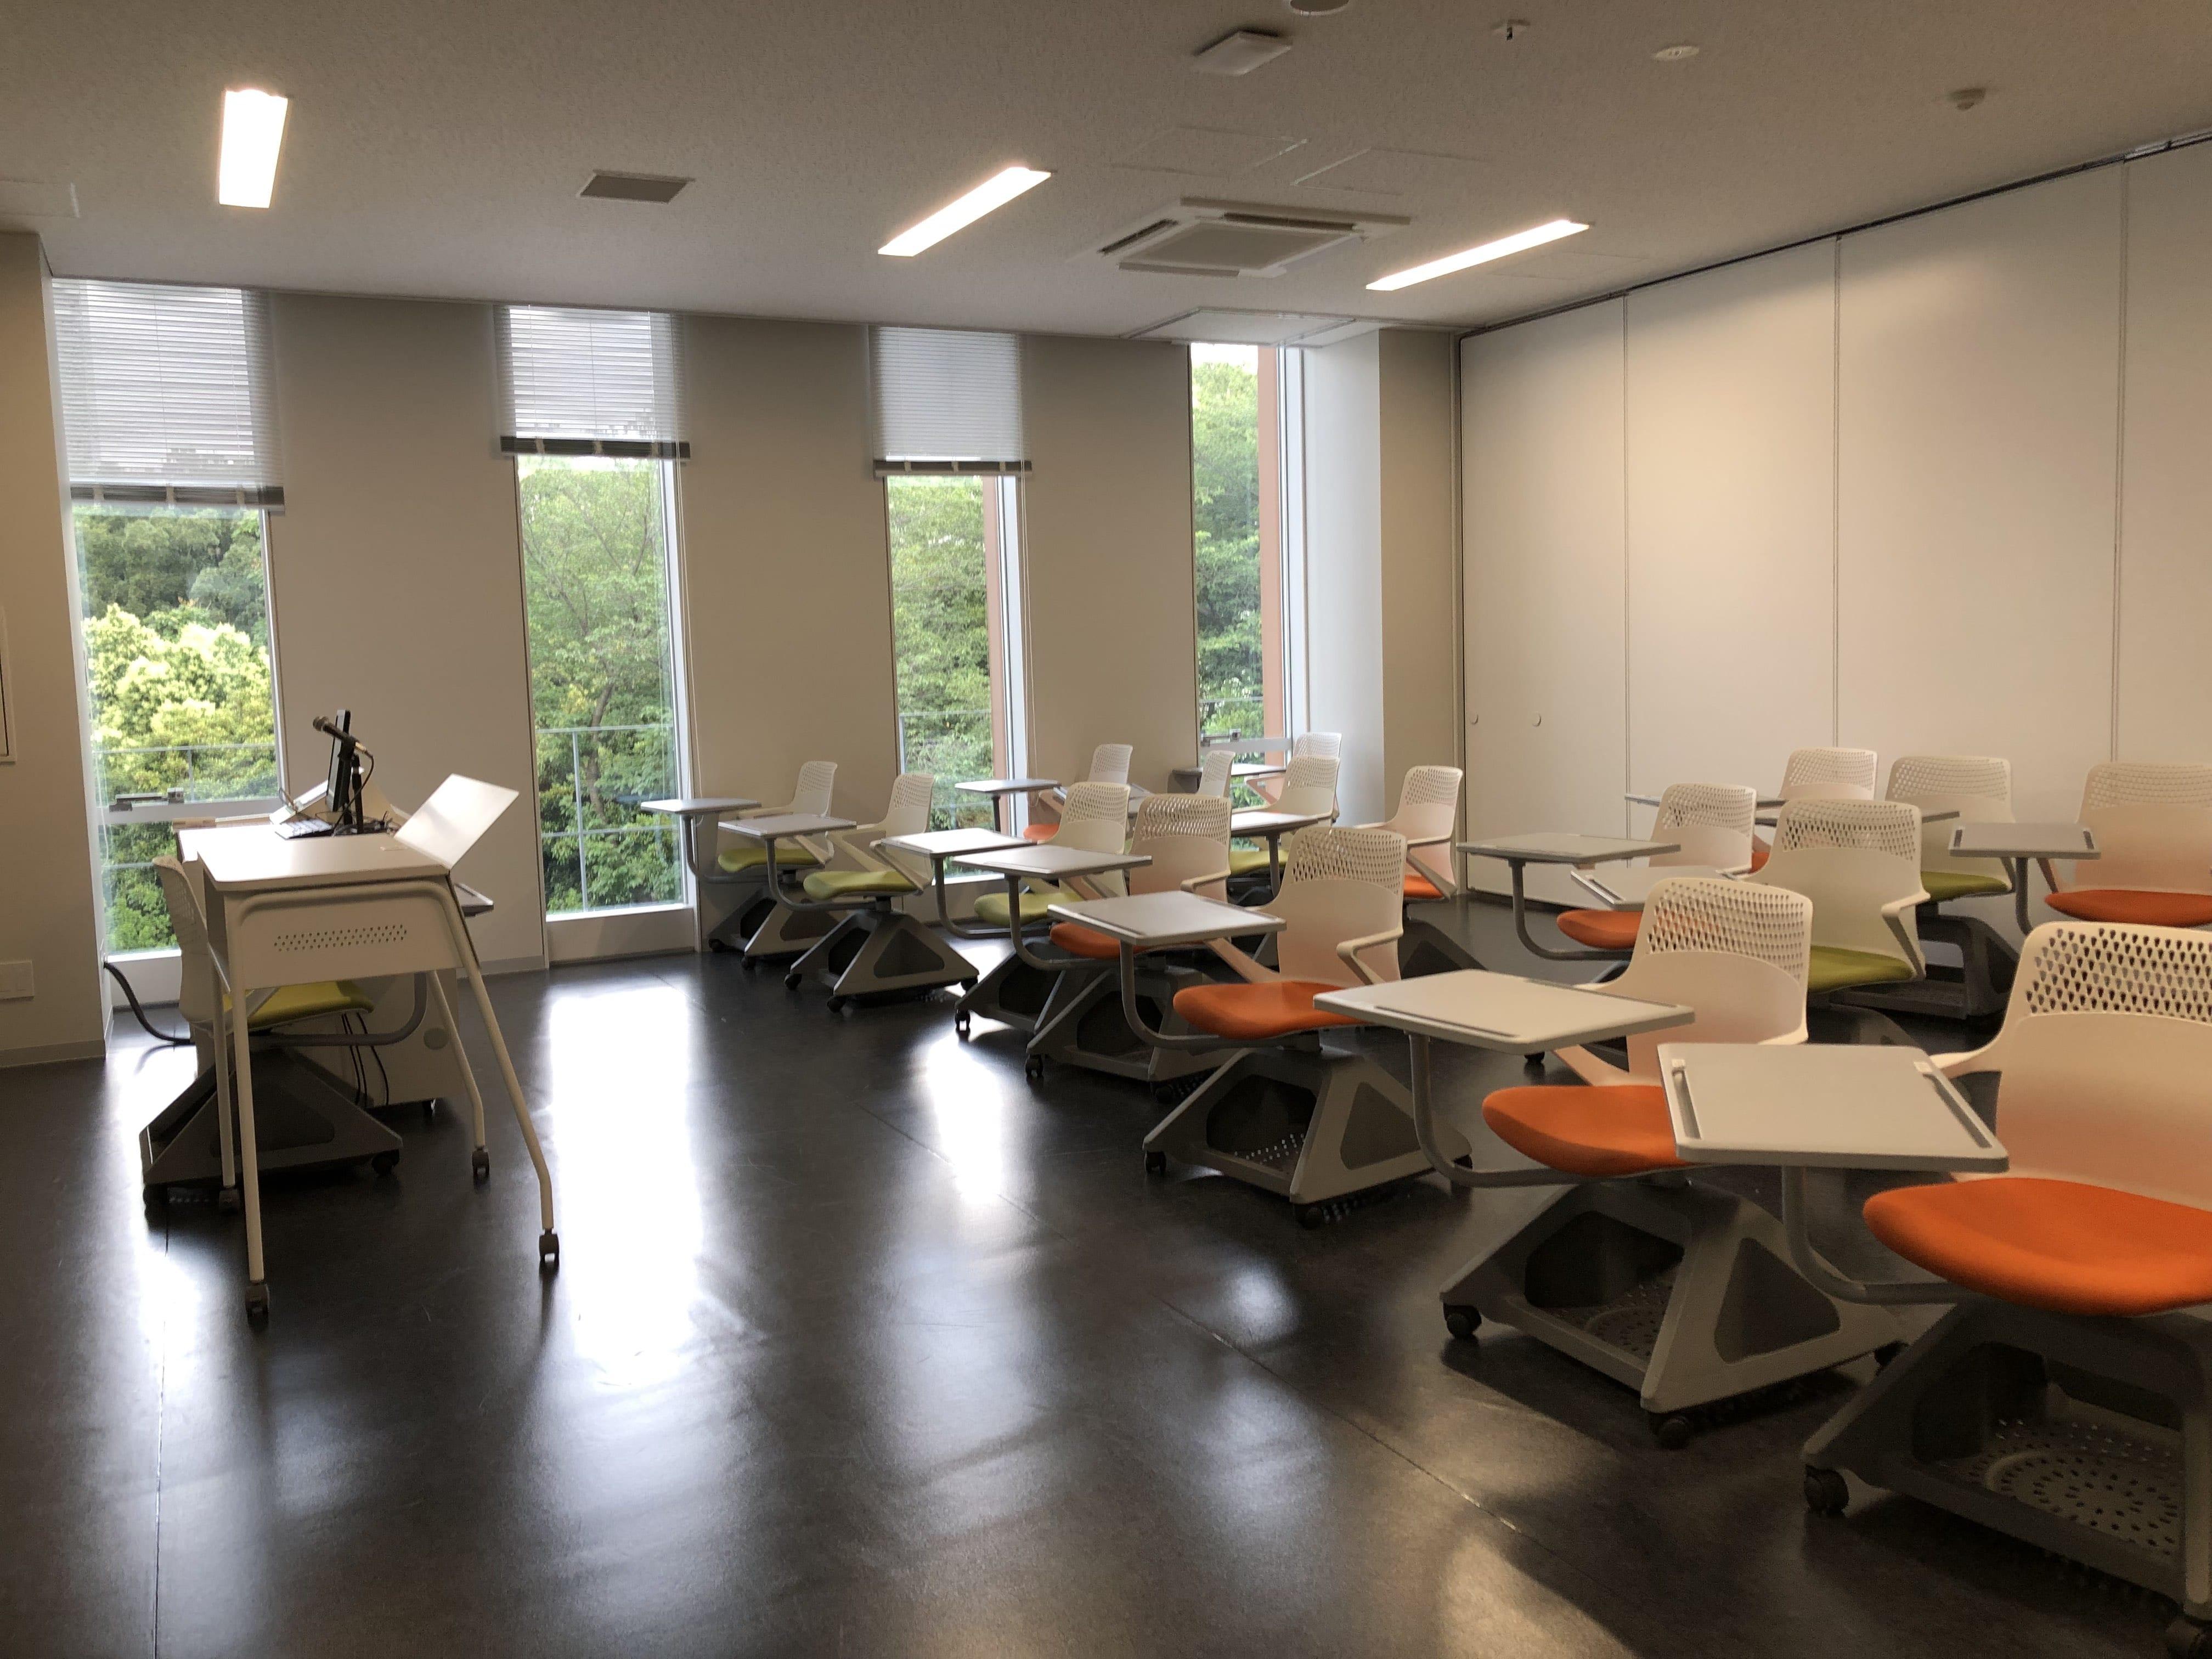 Oberlin University - Shinjuku Campus - photo 22